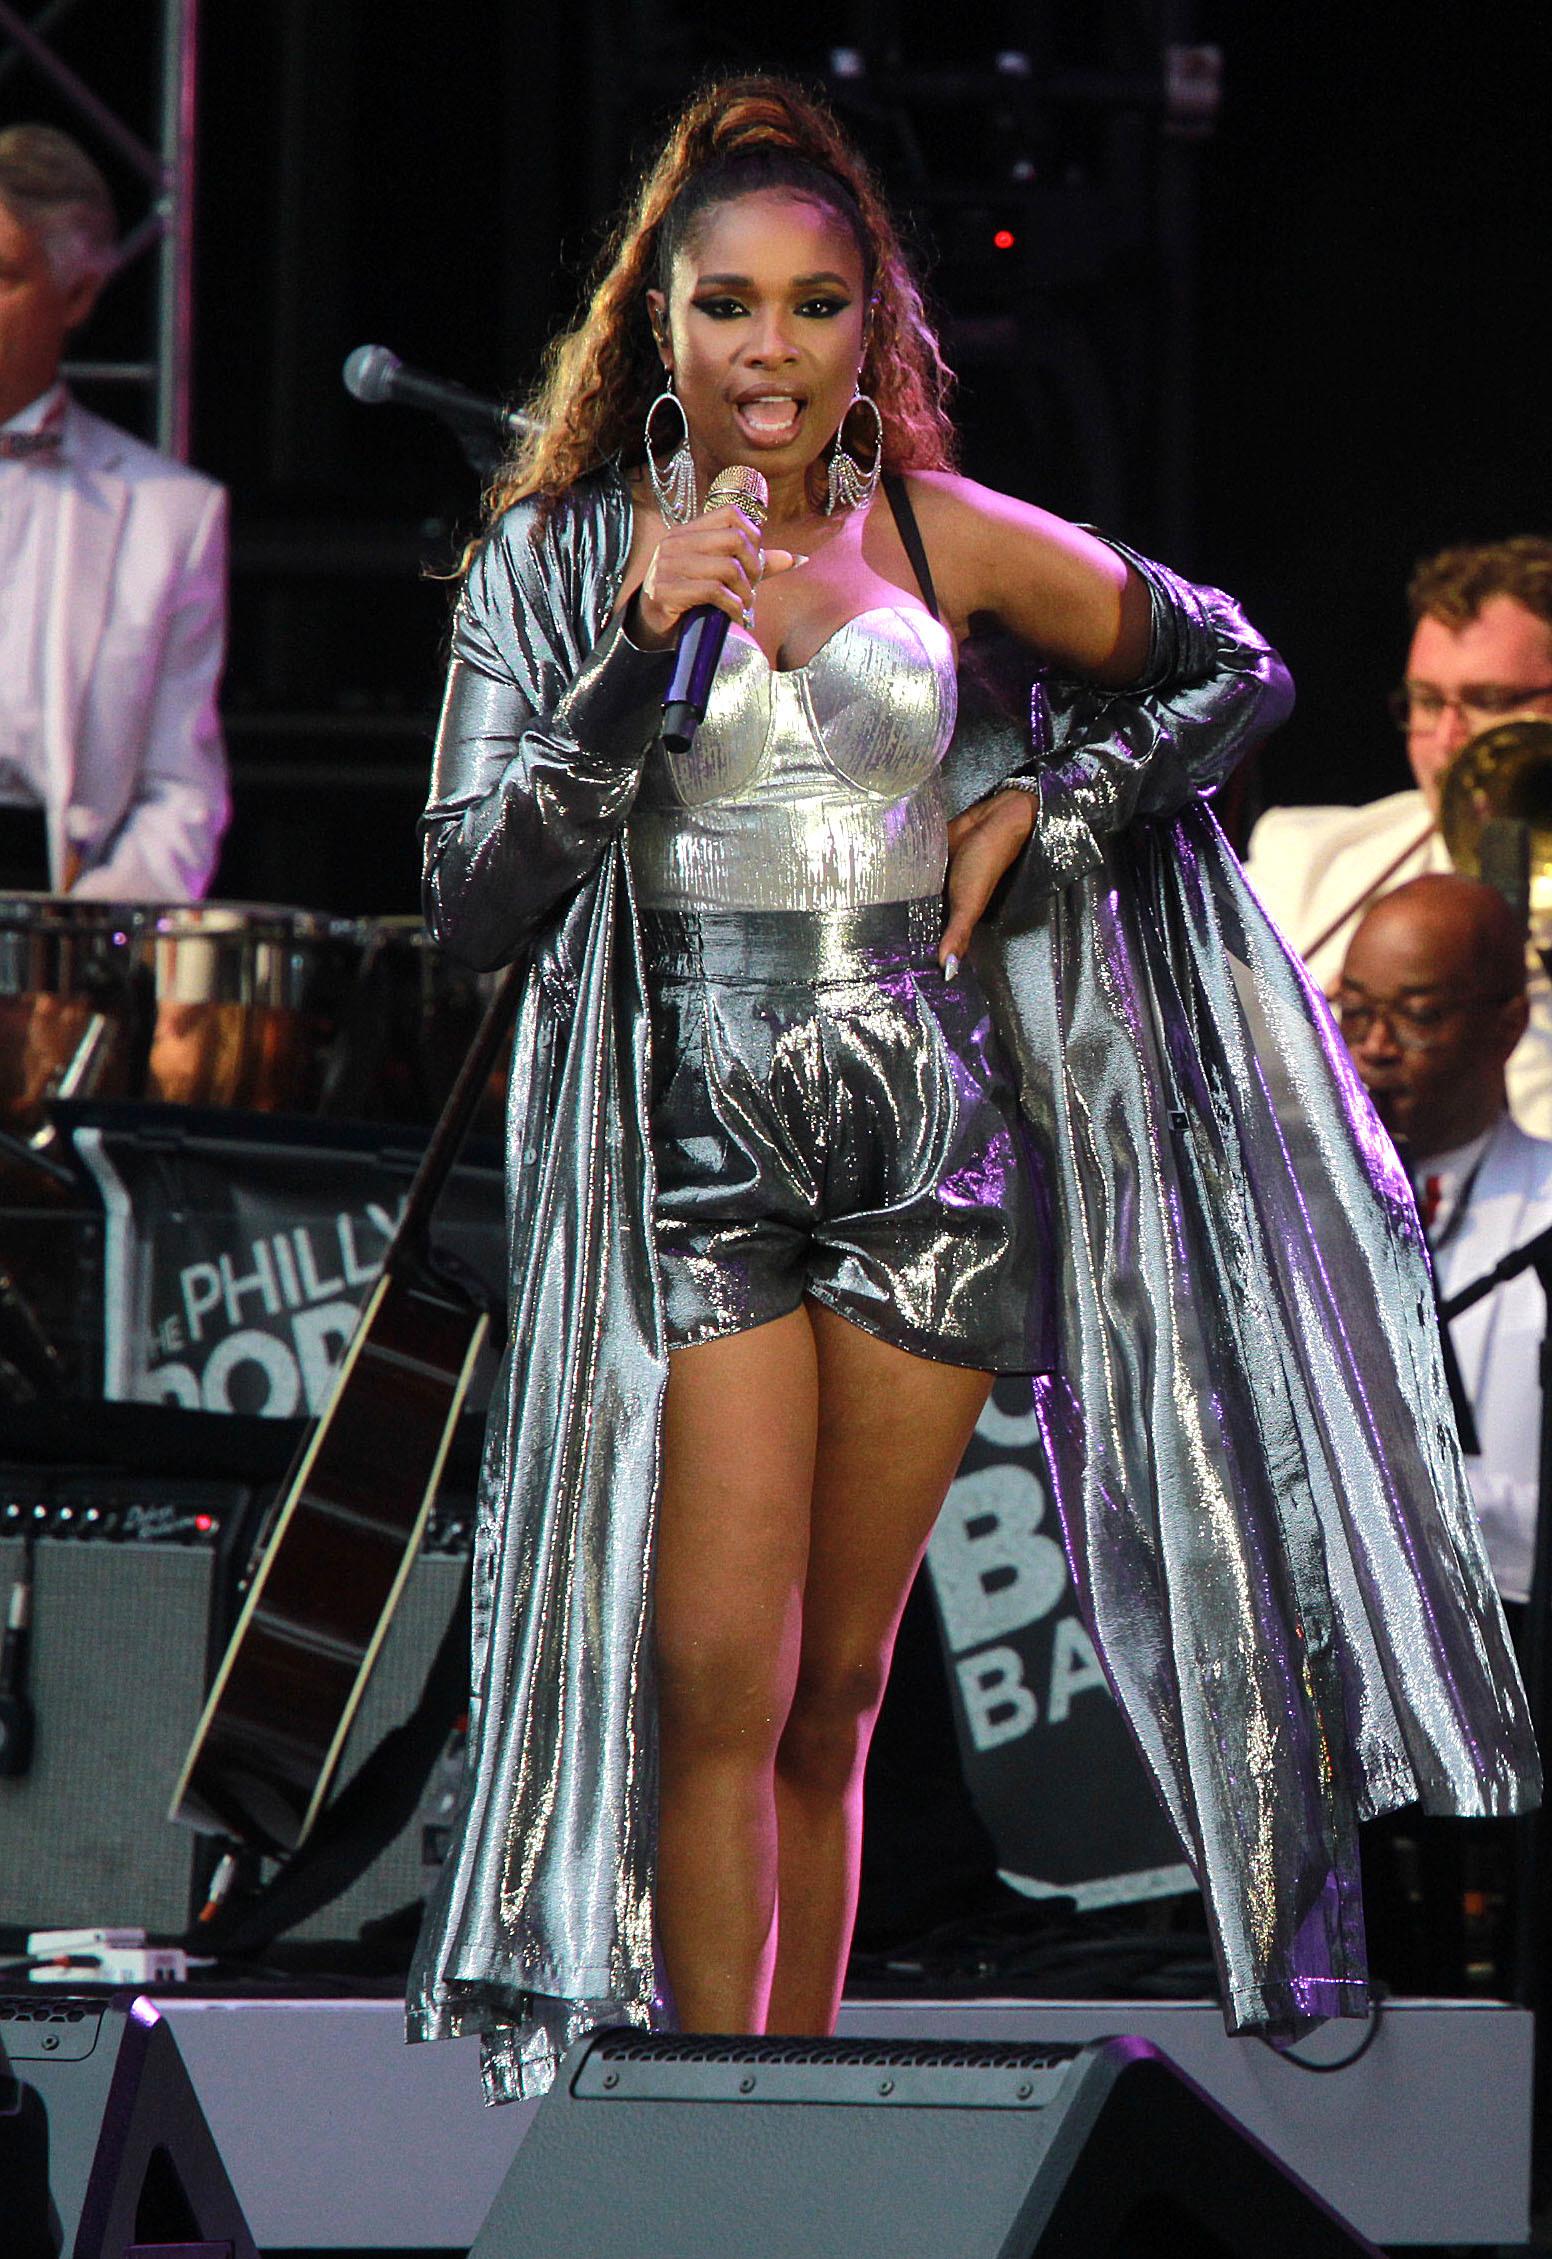 Jennifer Hudson performs during Independence Day celebrations in Philadelphia on July 4, 2019.